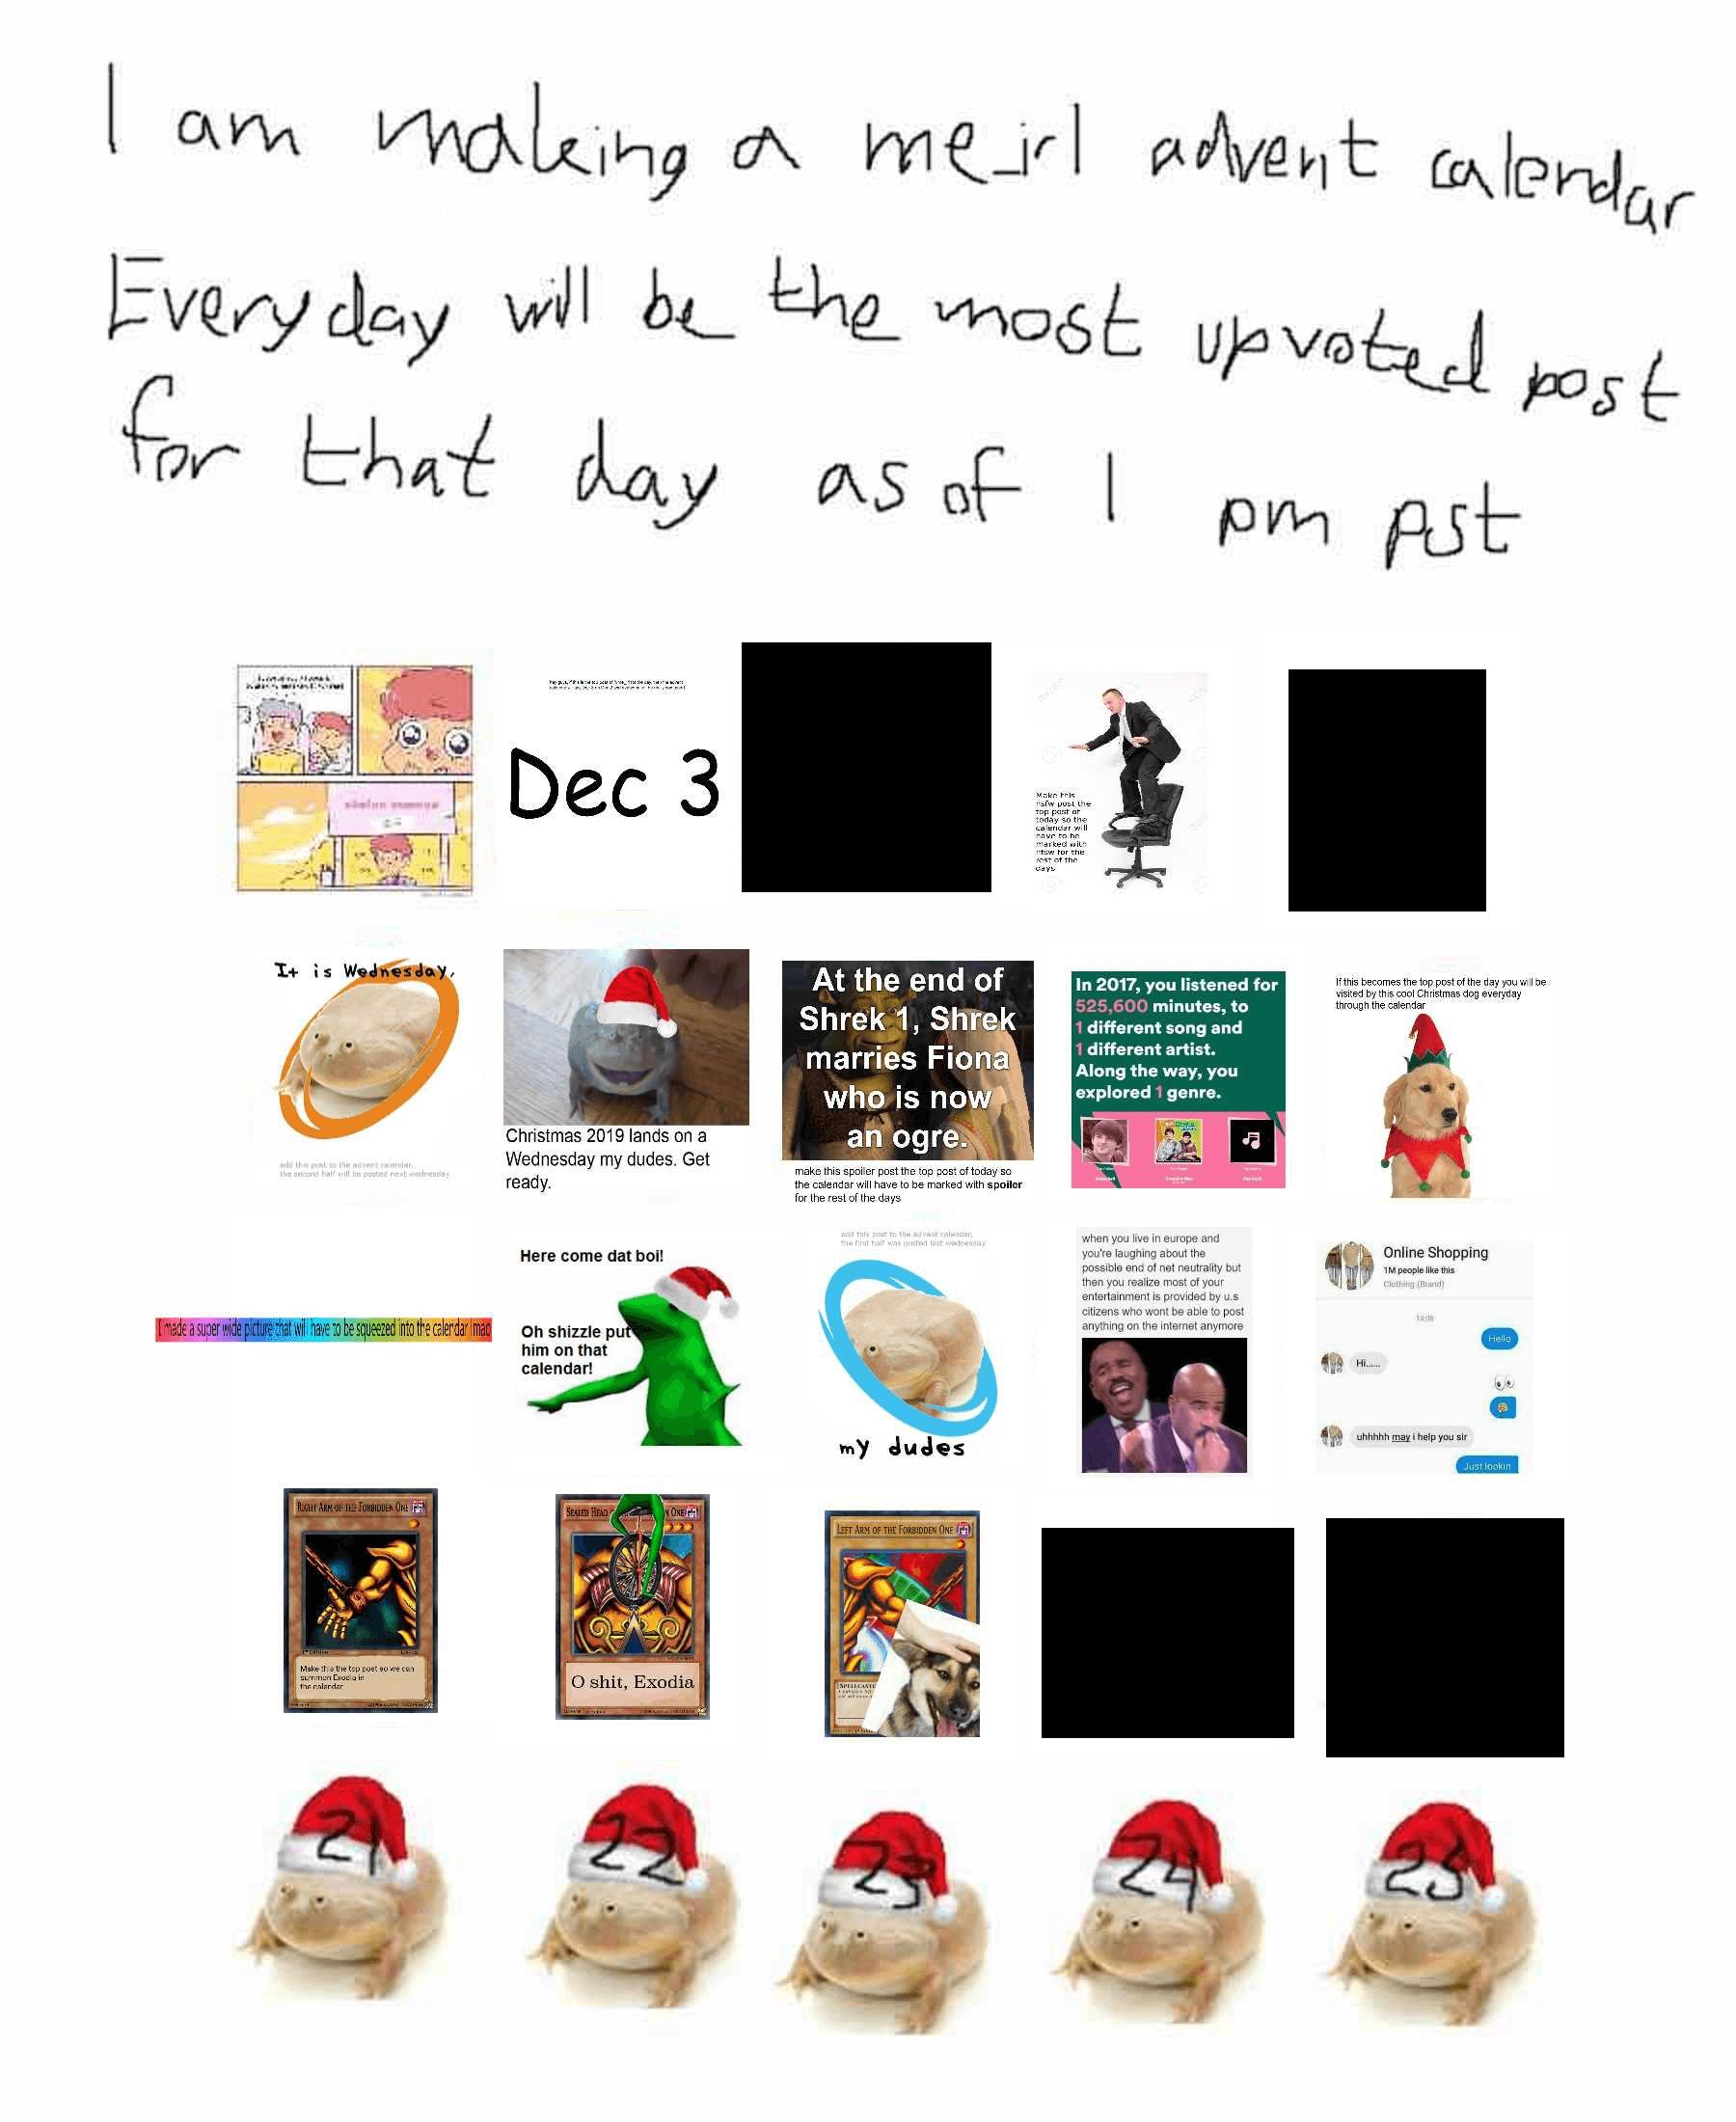 r/me_irl advent calendar 2017 - Dec 25